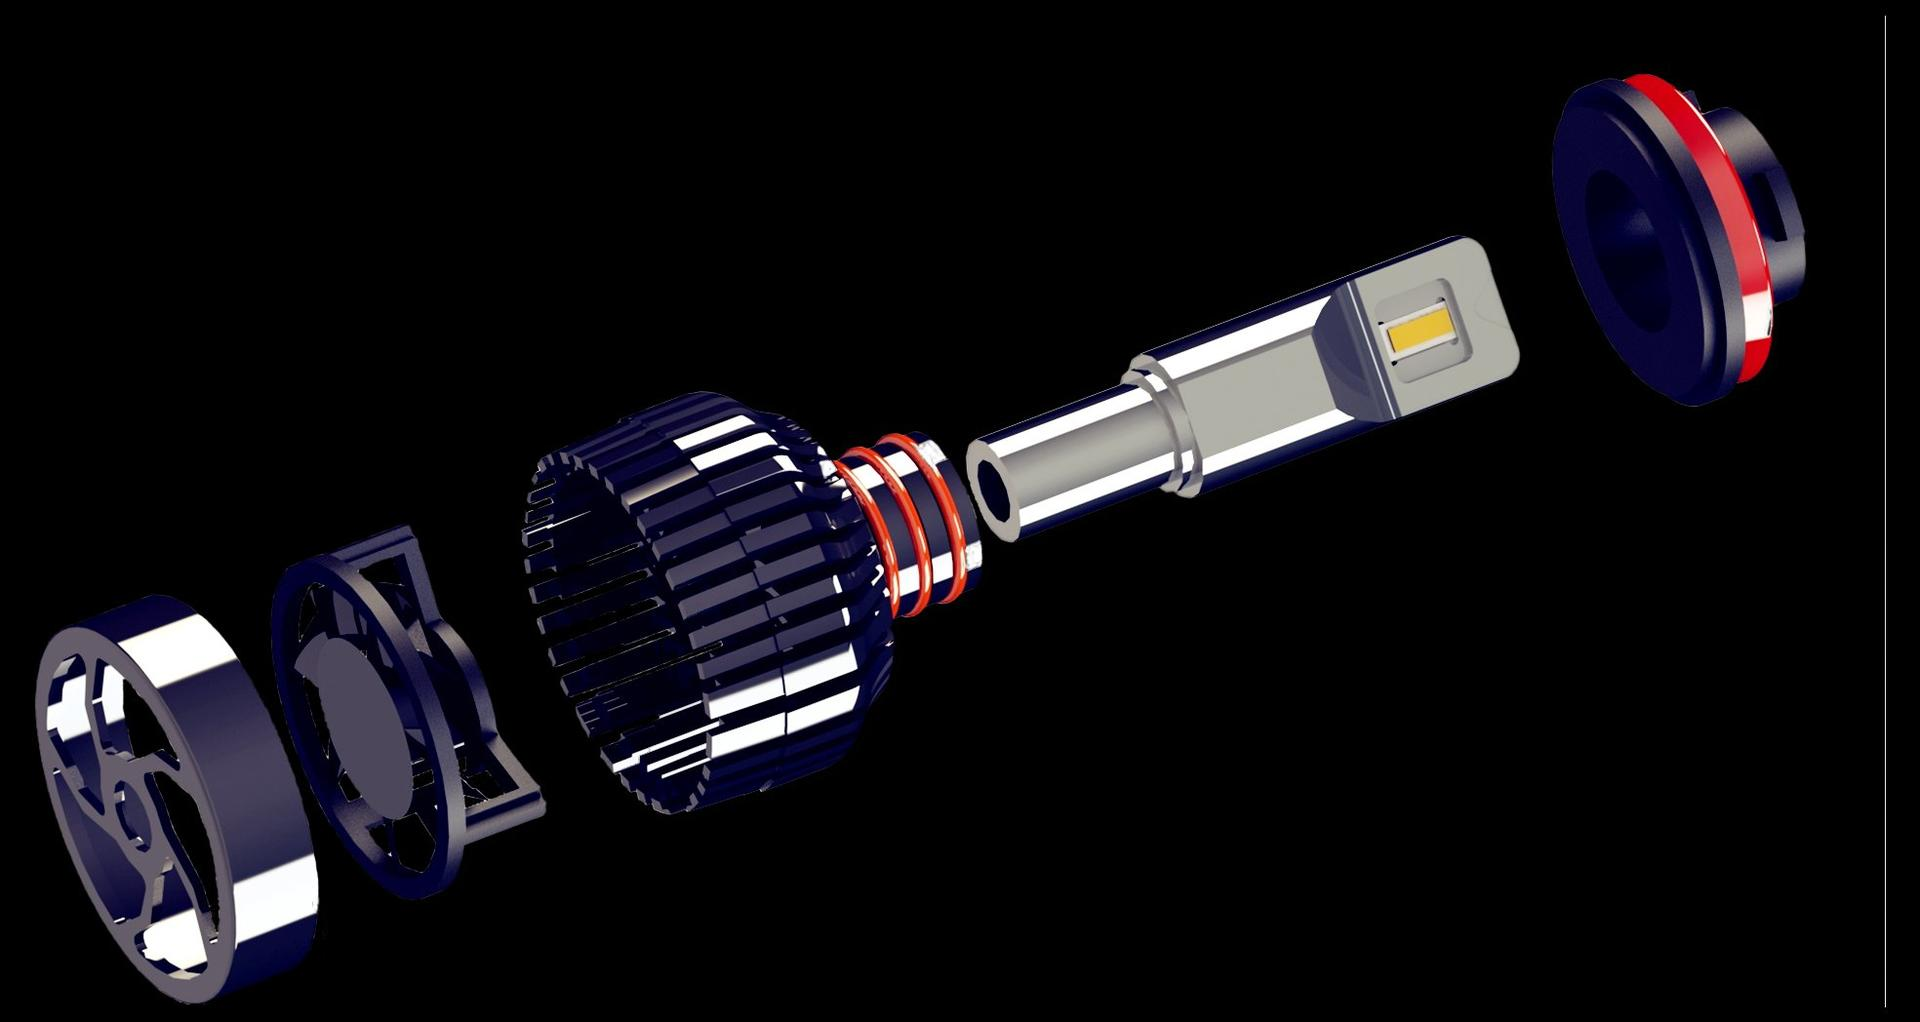 Automotive led headlight h1 h3 h7 h4 h8 h9 9005 9006 high power car led lights